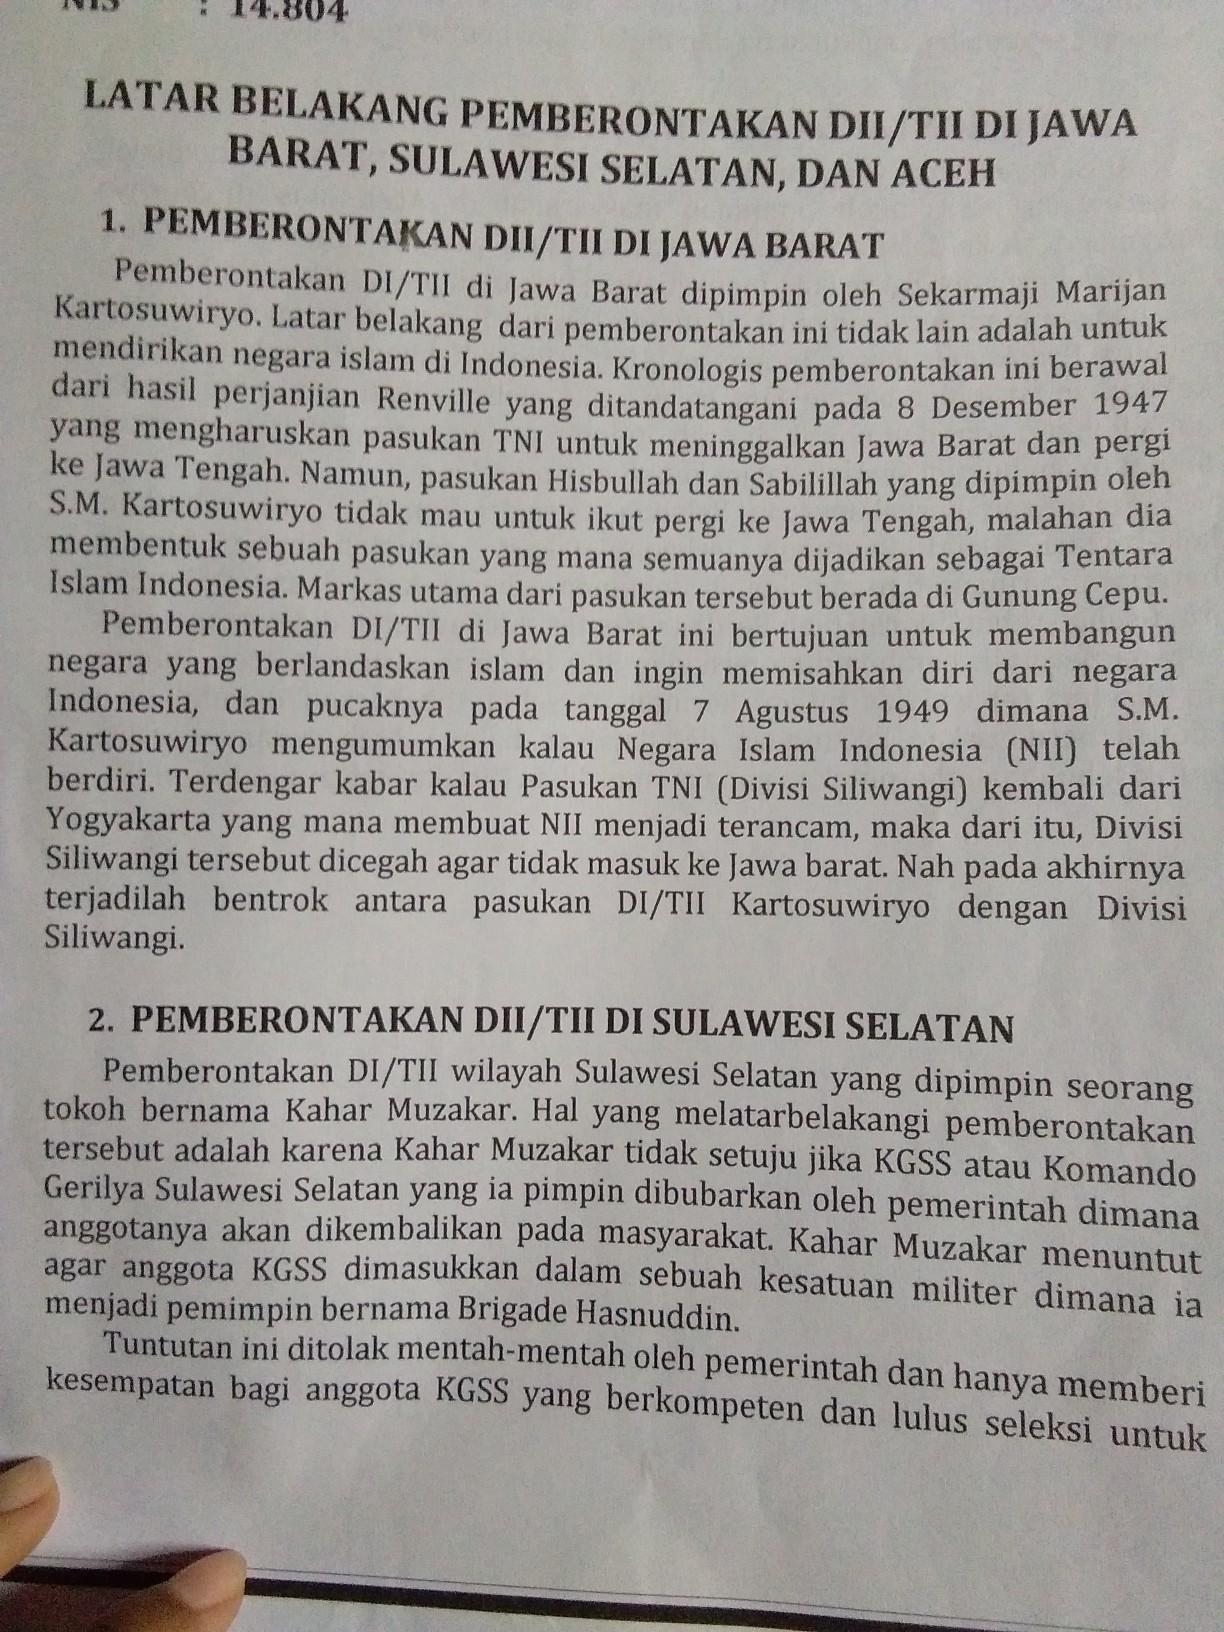 Latar Belakang Di/tii Jawa Tengah : latar, belakang, di/tii, tengah, Sebab, Pemberontakan, DI/TII, Barat,, Tengah,, Sulawesi, Selatan?, Brainly.co.id